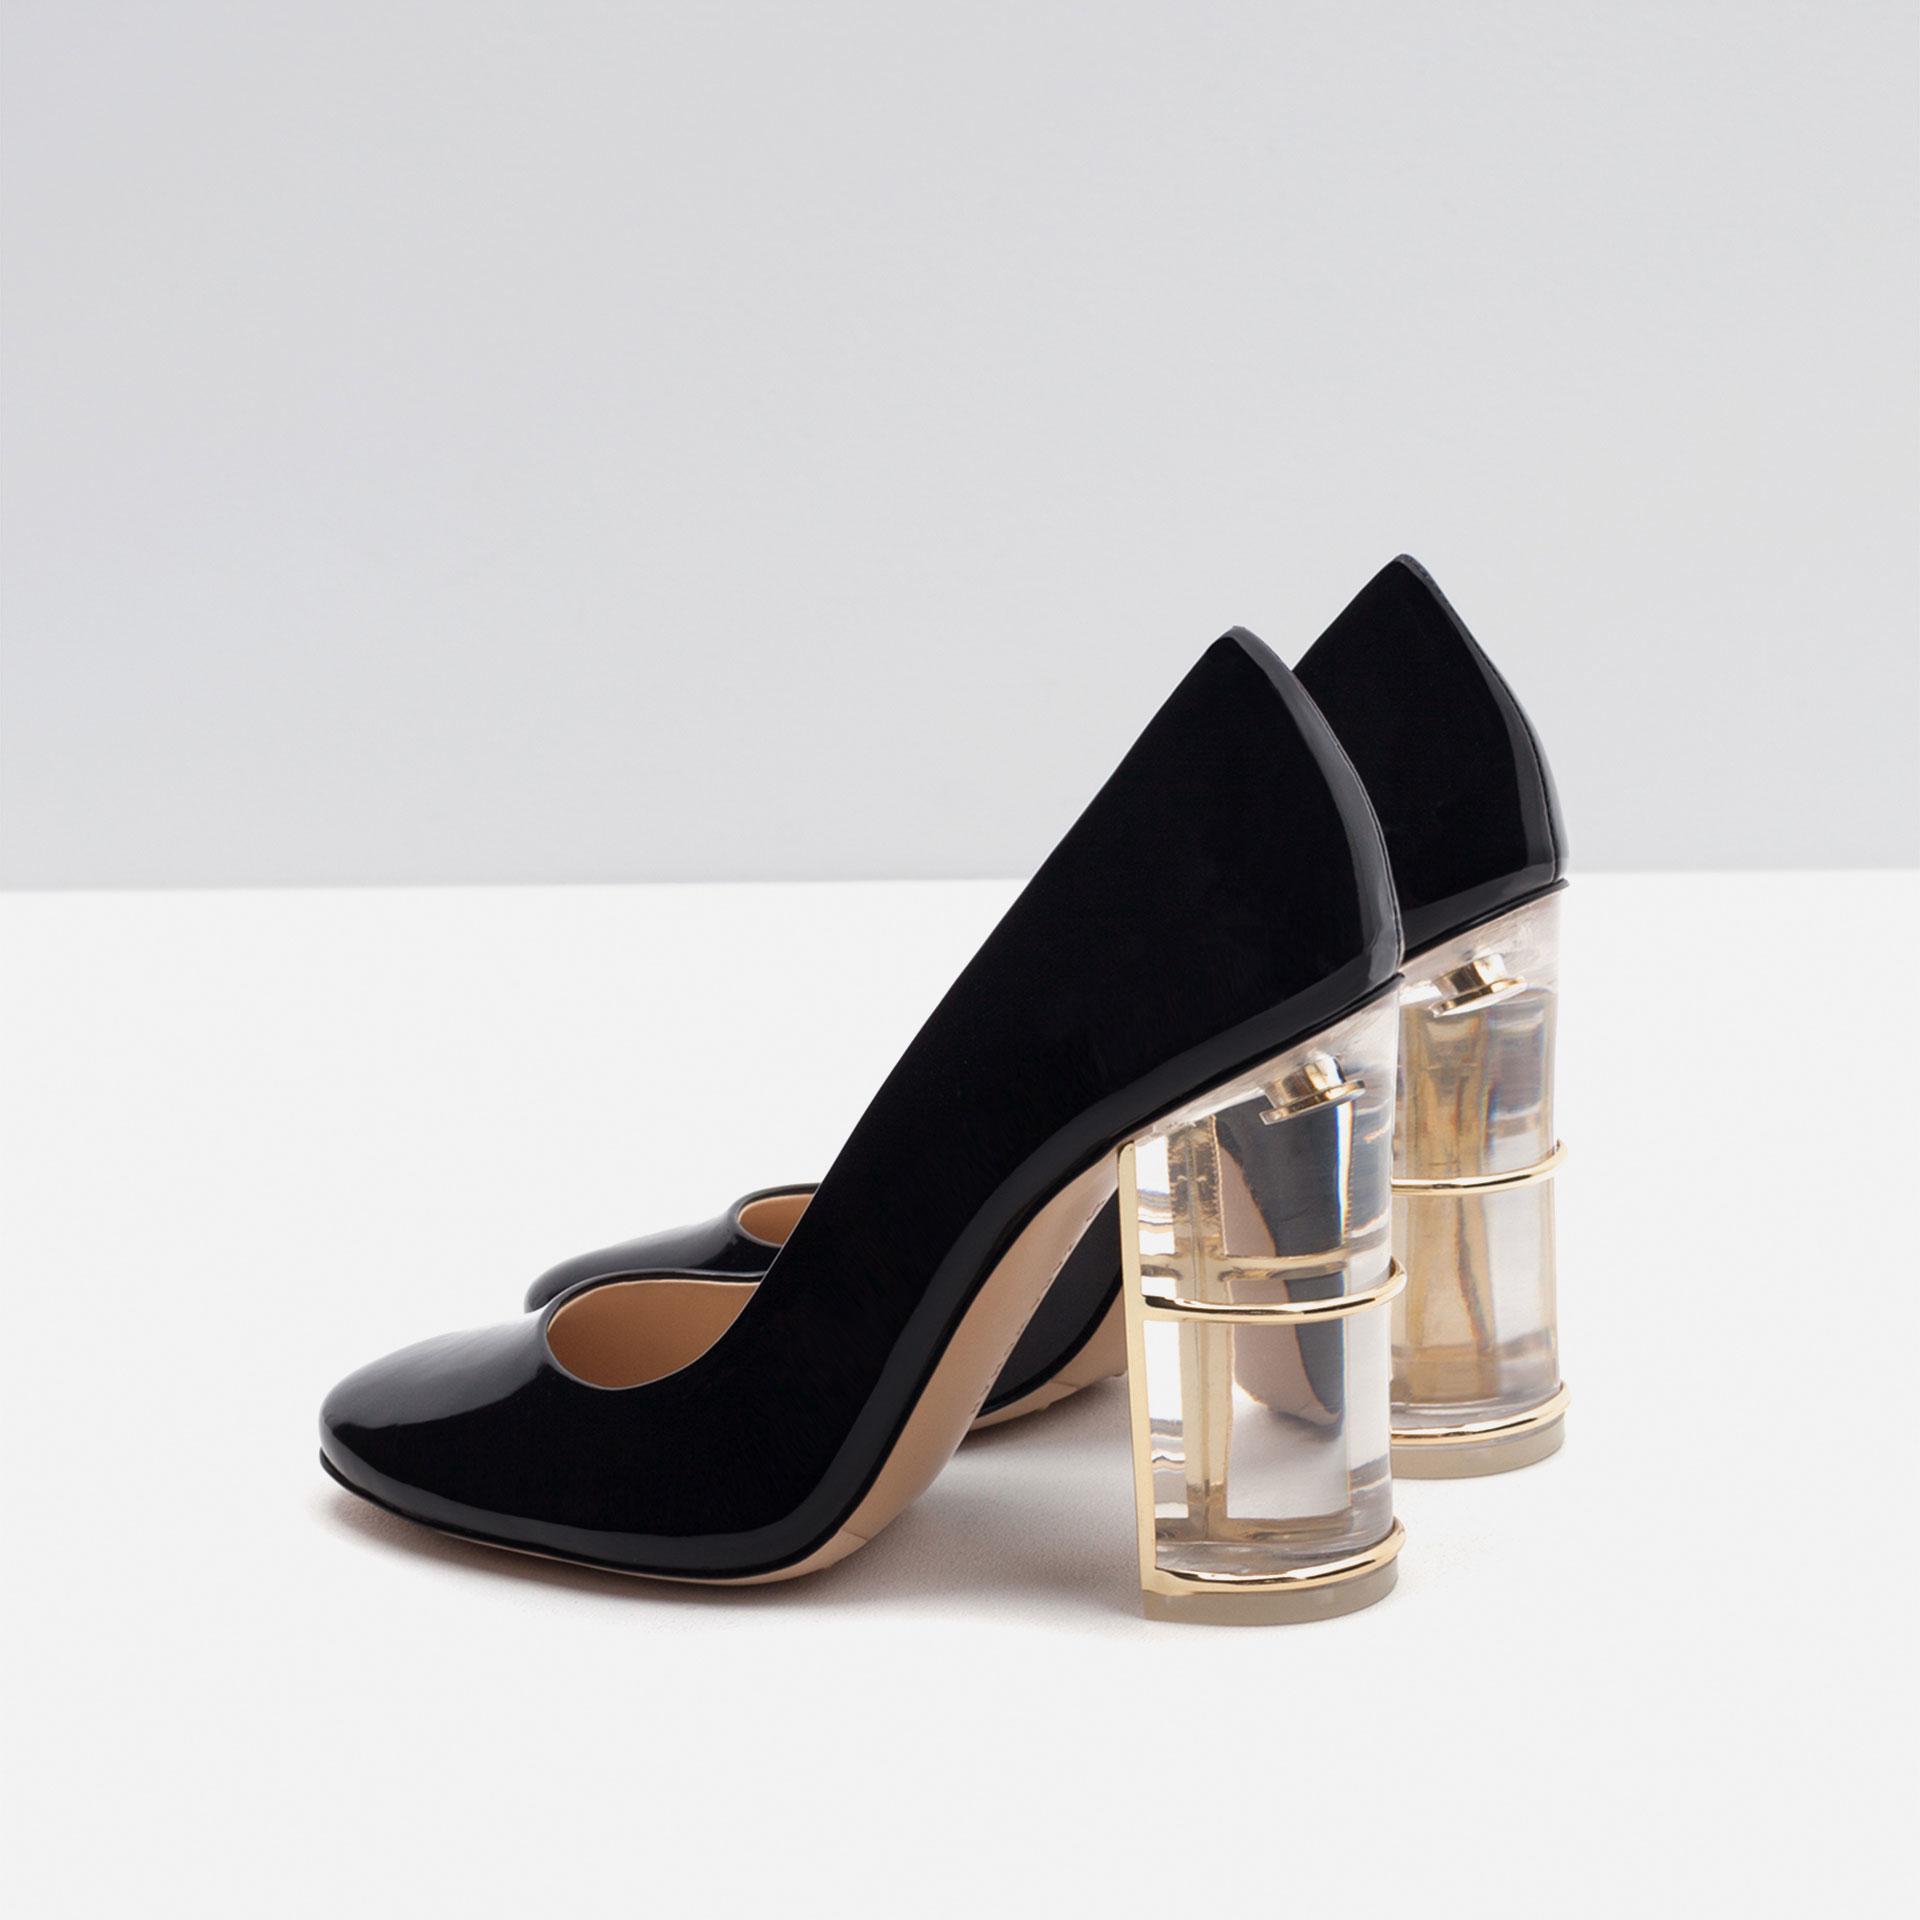 Zara Shoes For Mens Online